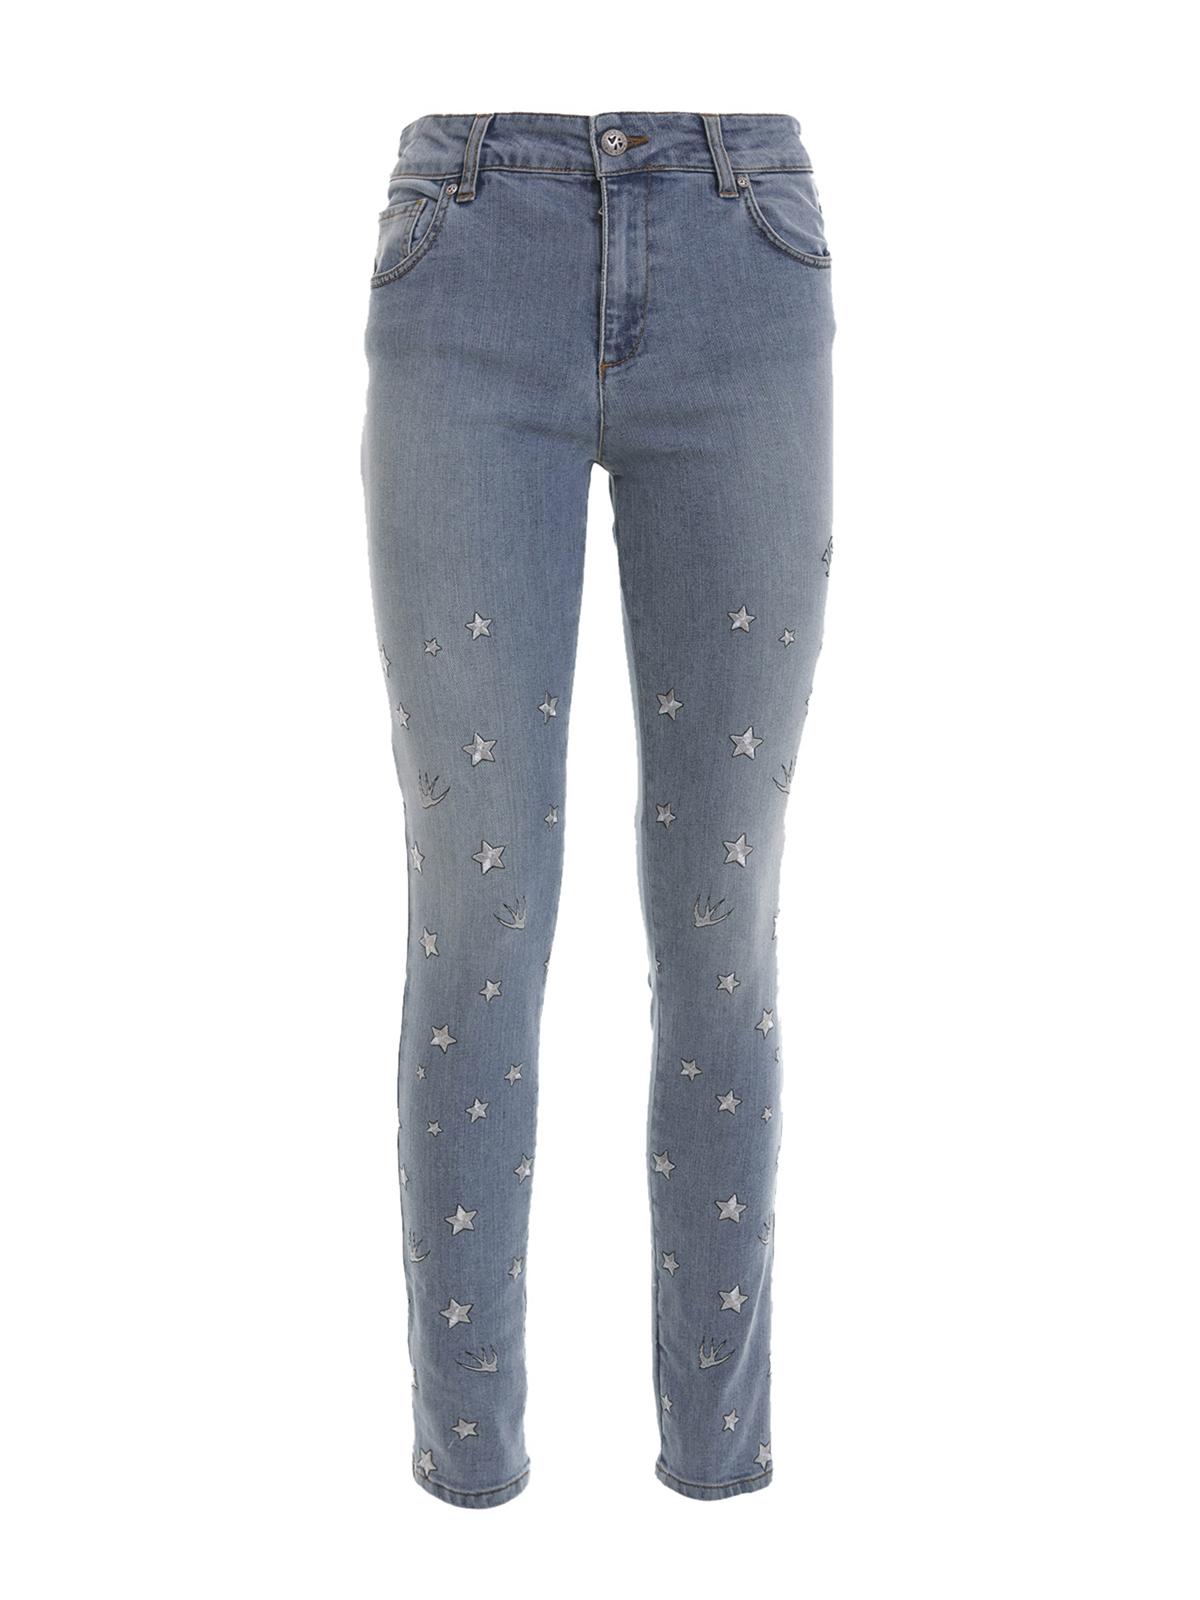 Embroidered Stars Jeans By John Richmond - Skinny Jeans | IKRIX